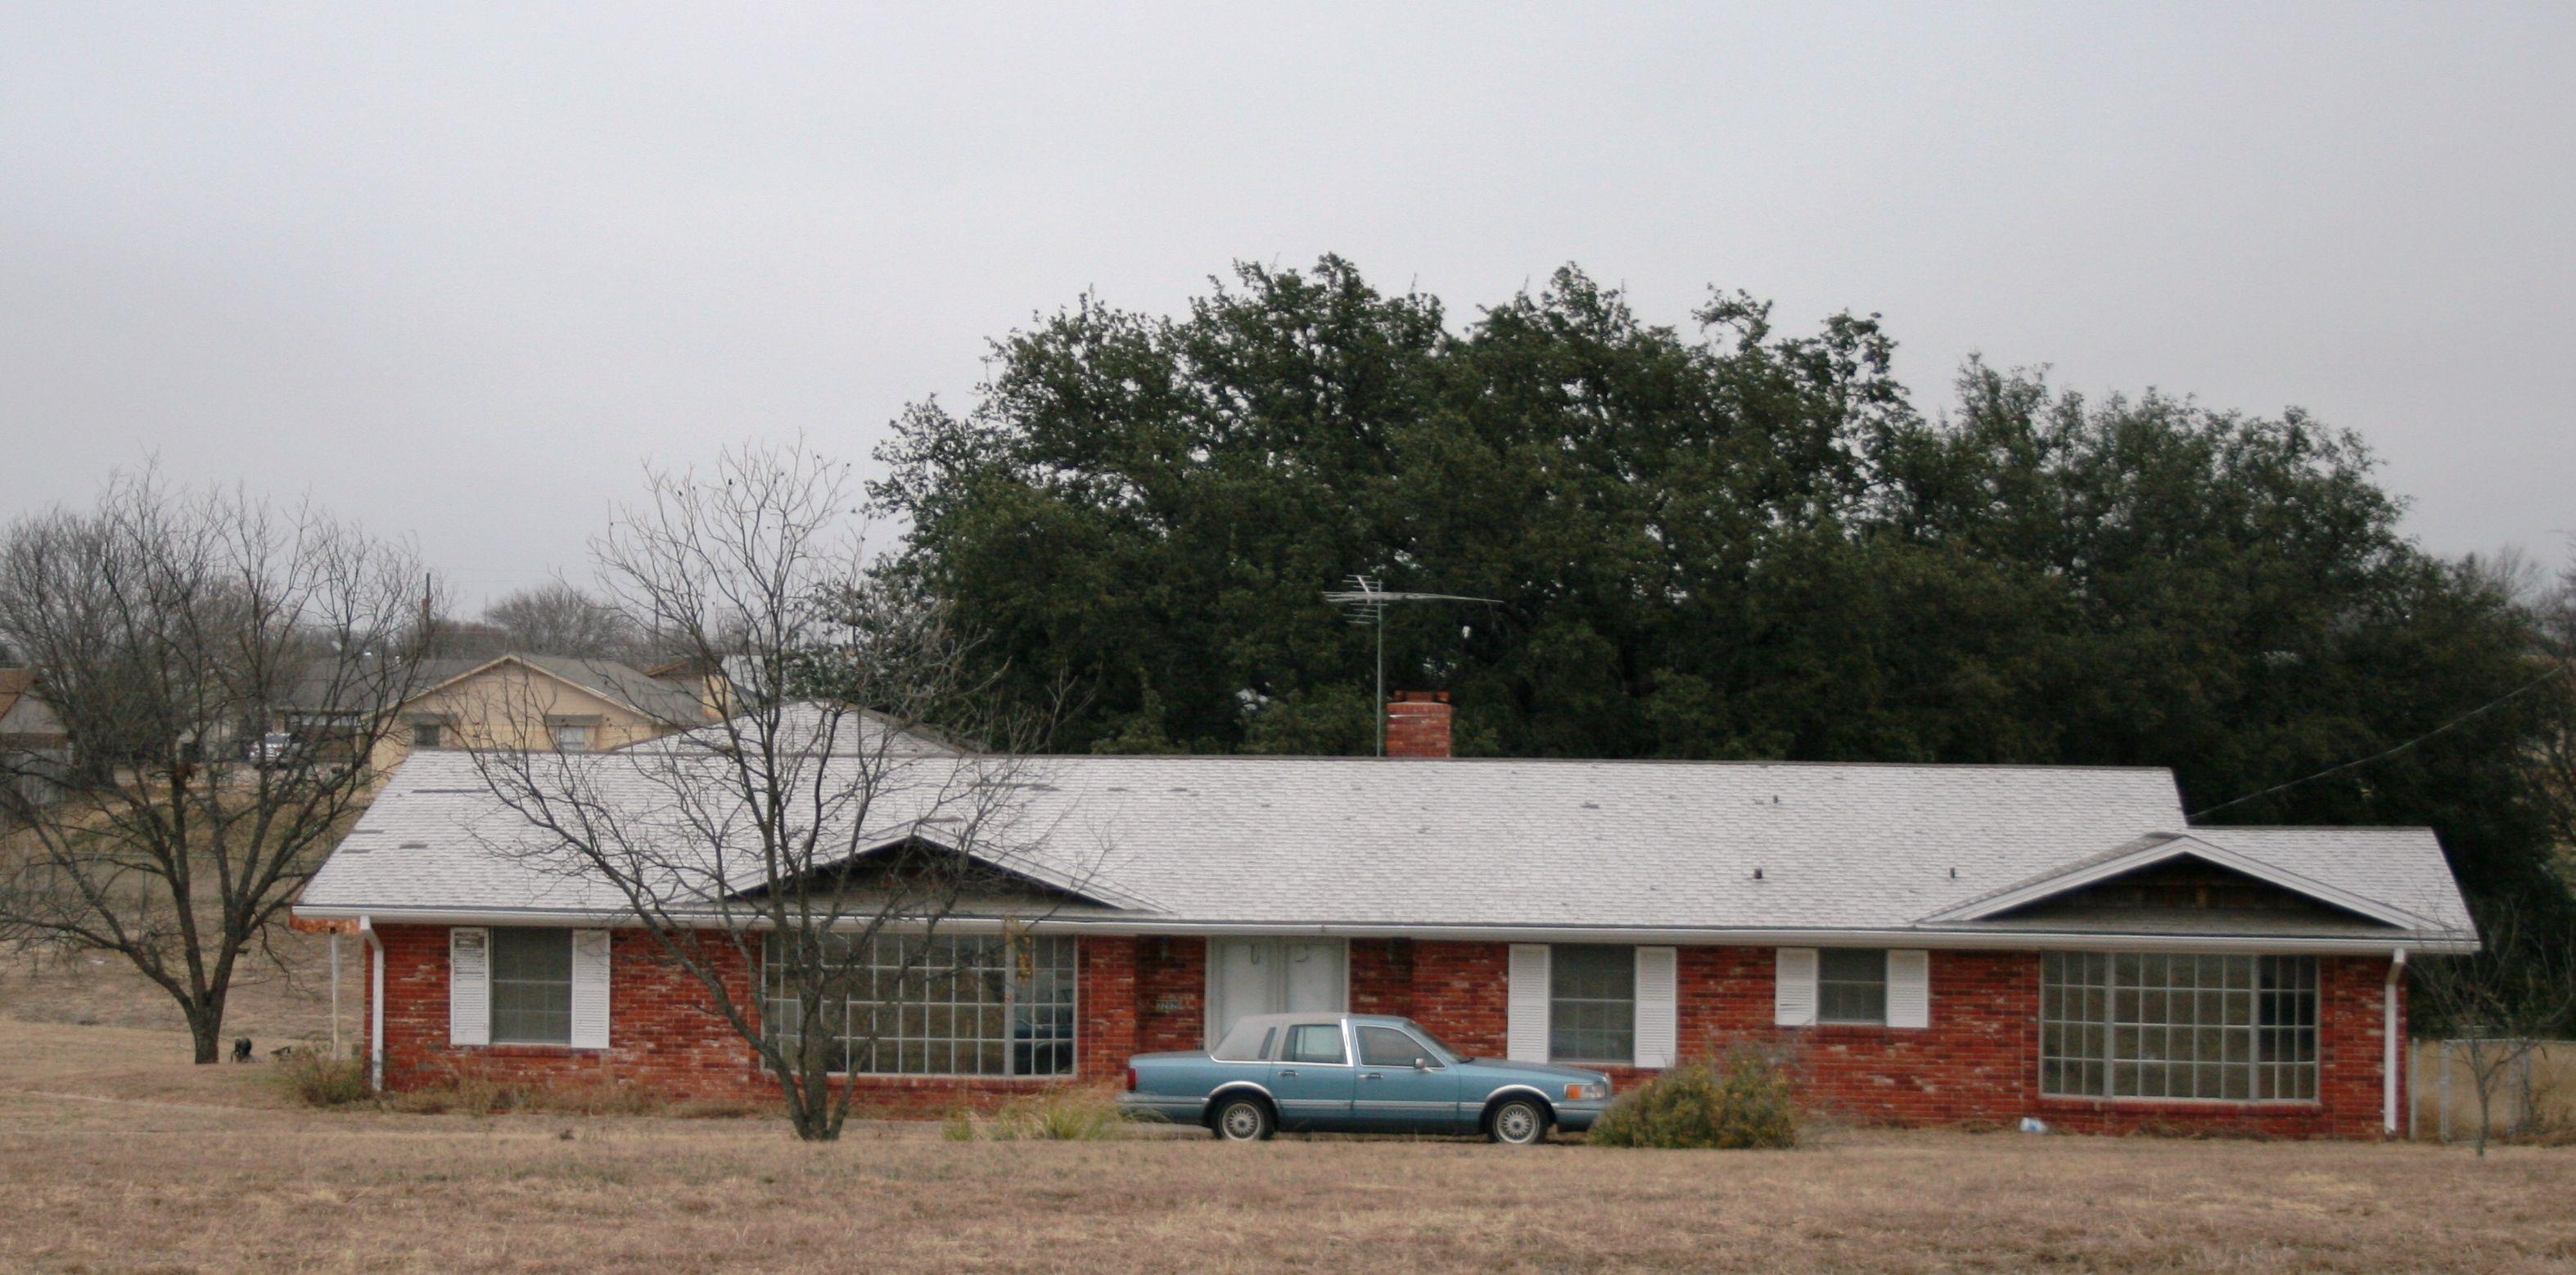 Home For Sale Killeen Texas 3100 Sf Home On 8 5 Acres In Killeen Texas Horses Ok 4 Bedroom 3 Bath 2 Living 2 D Texas Homes For Sale Killeen Texas Homes